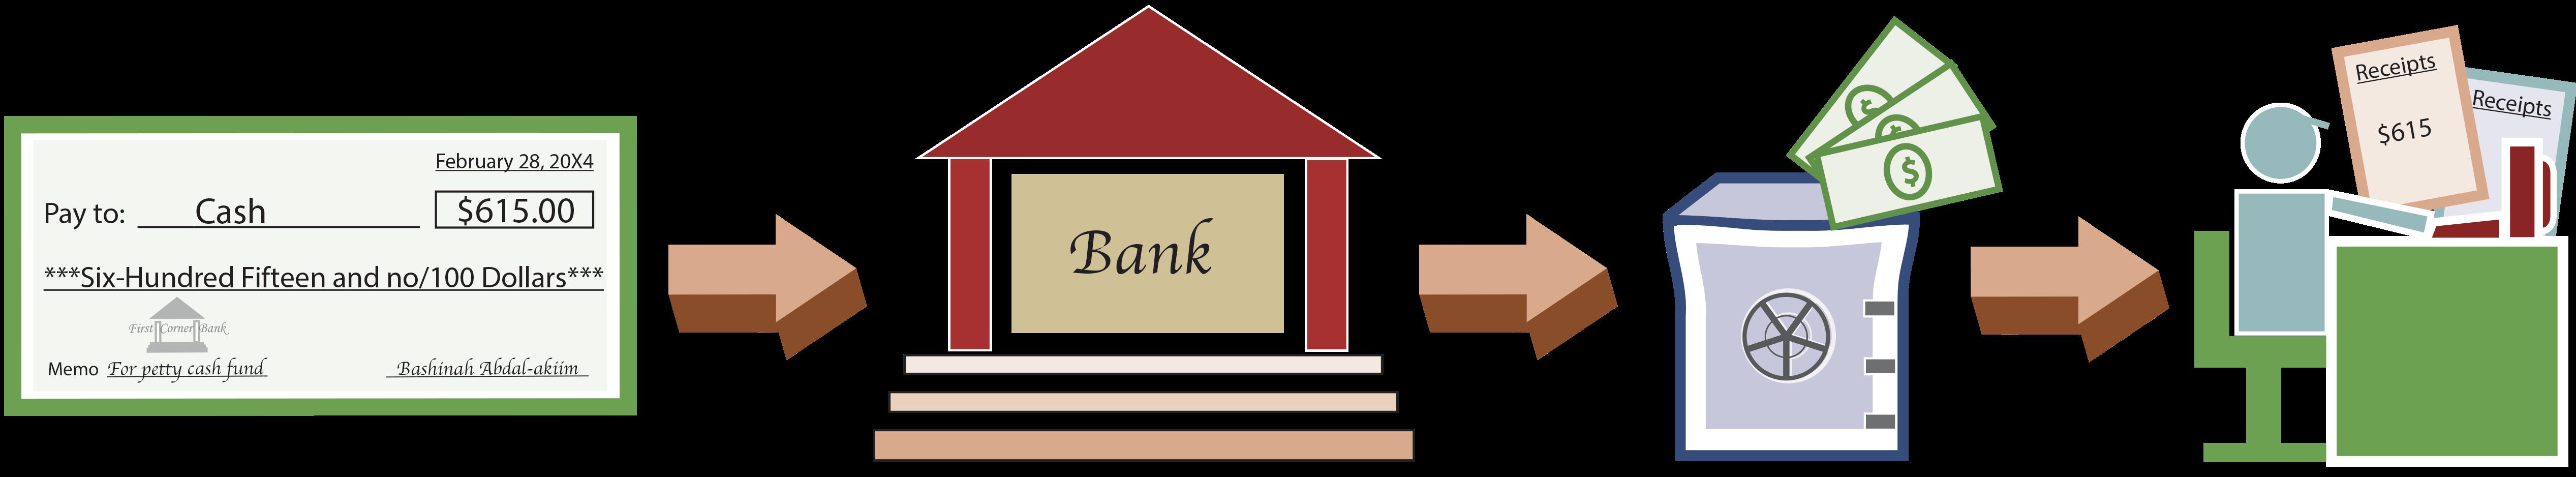 Replenishment of Petty Cash illustration